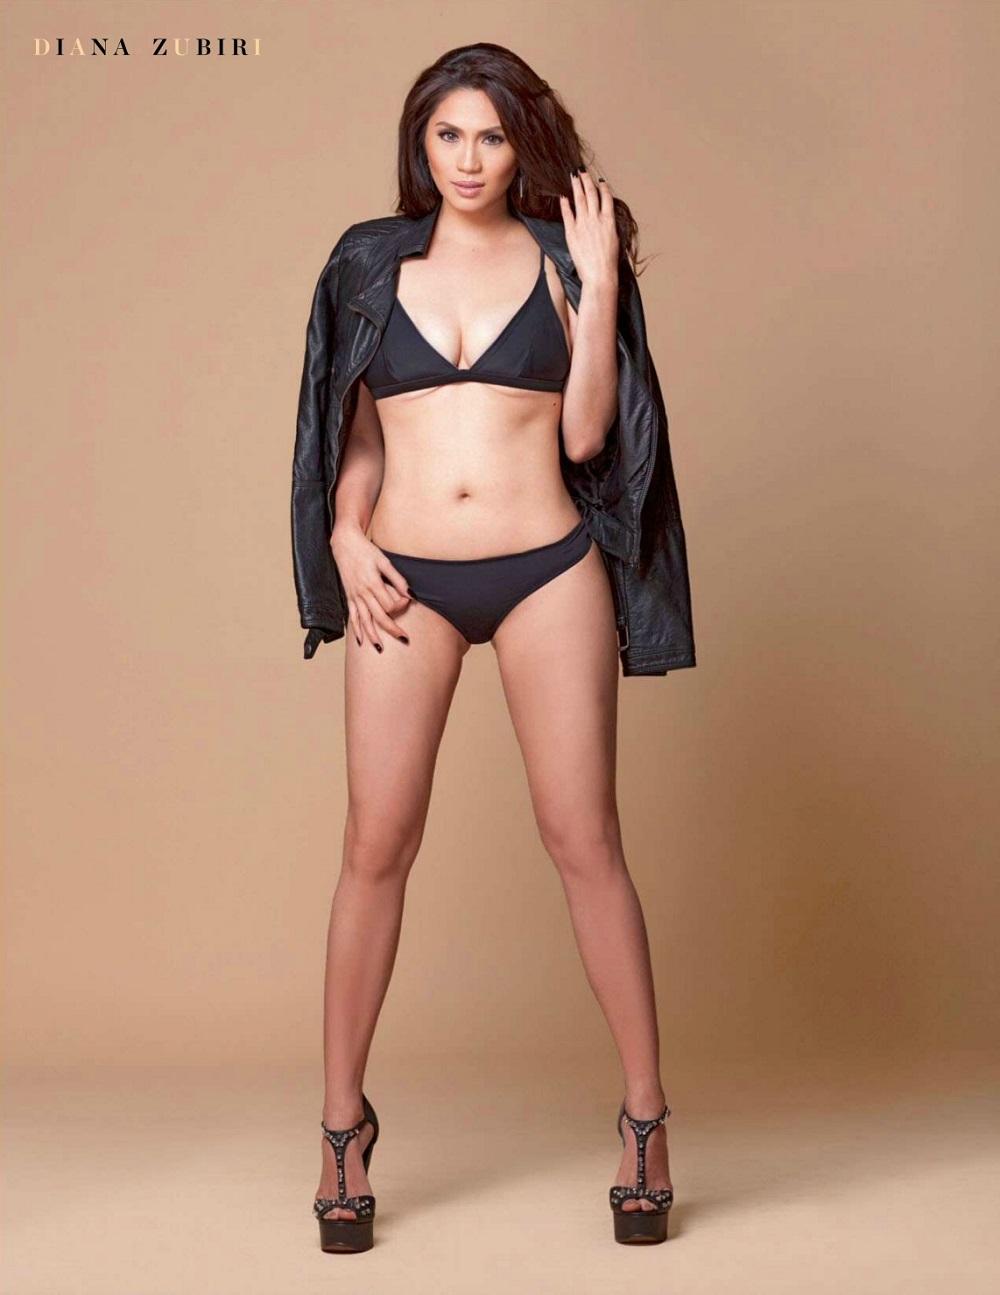 diana zubiri sexy fhm topless pics 05